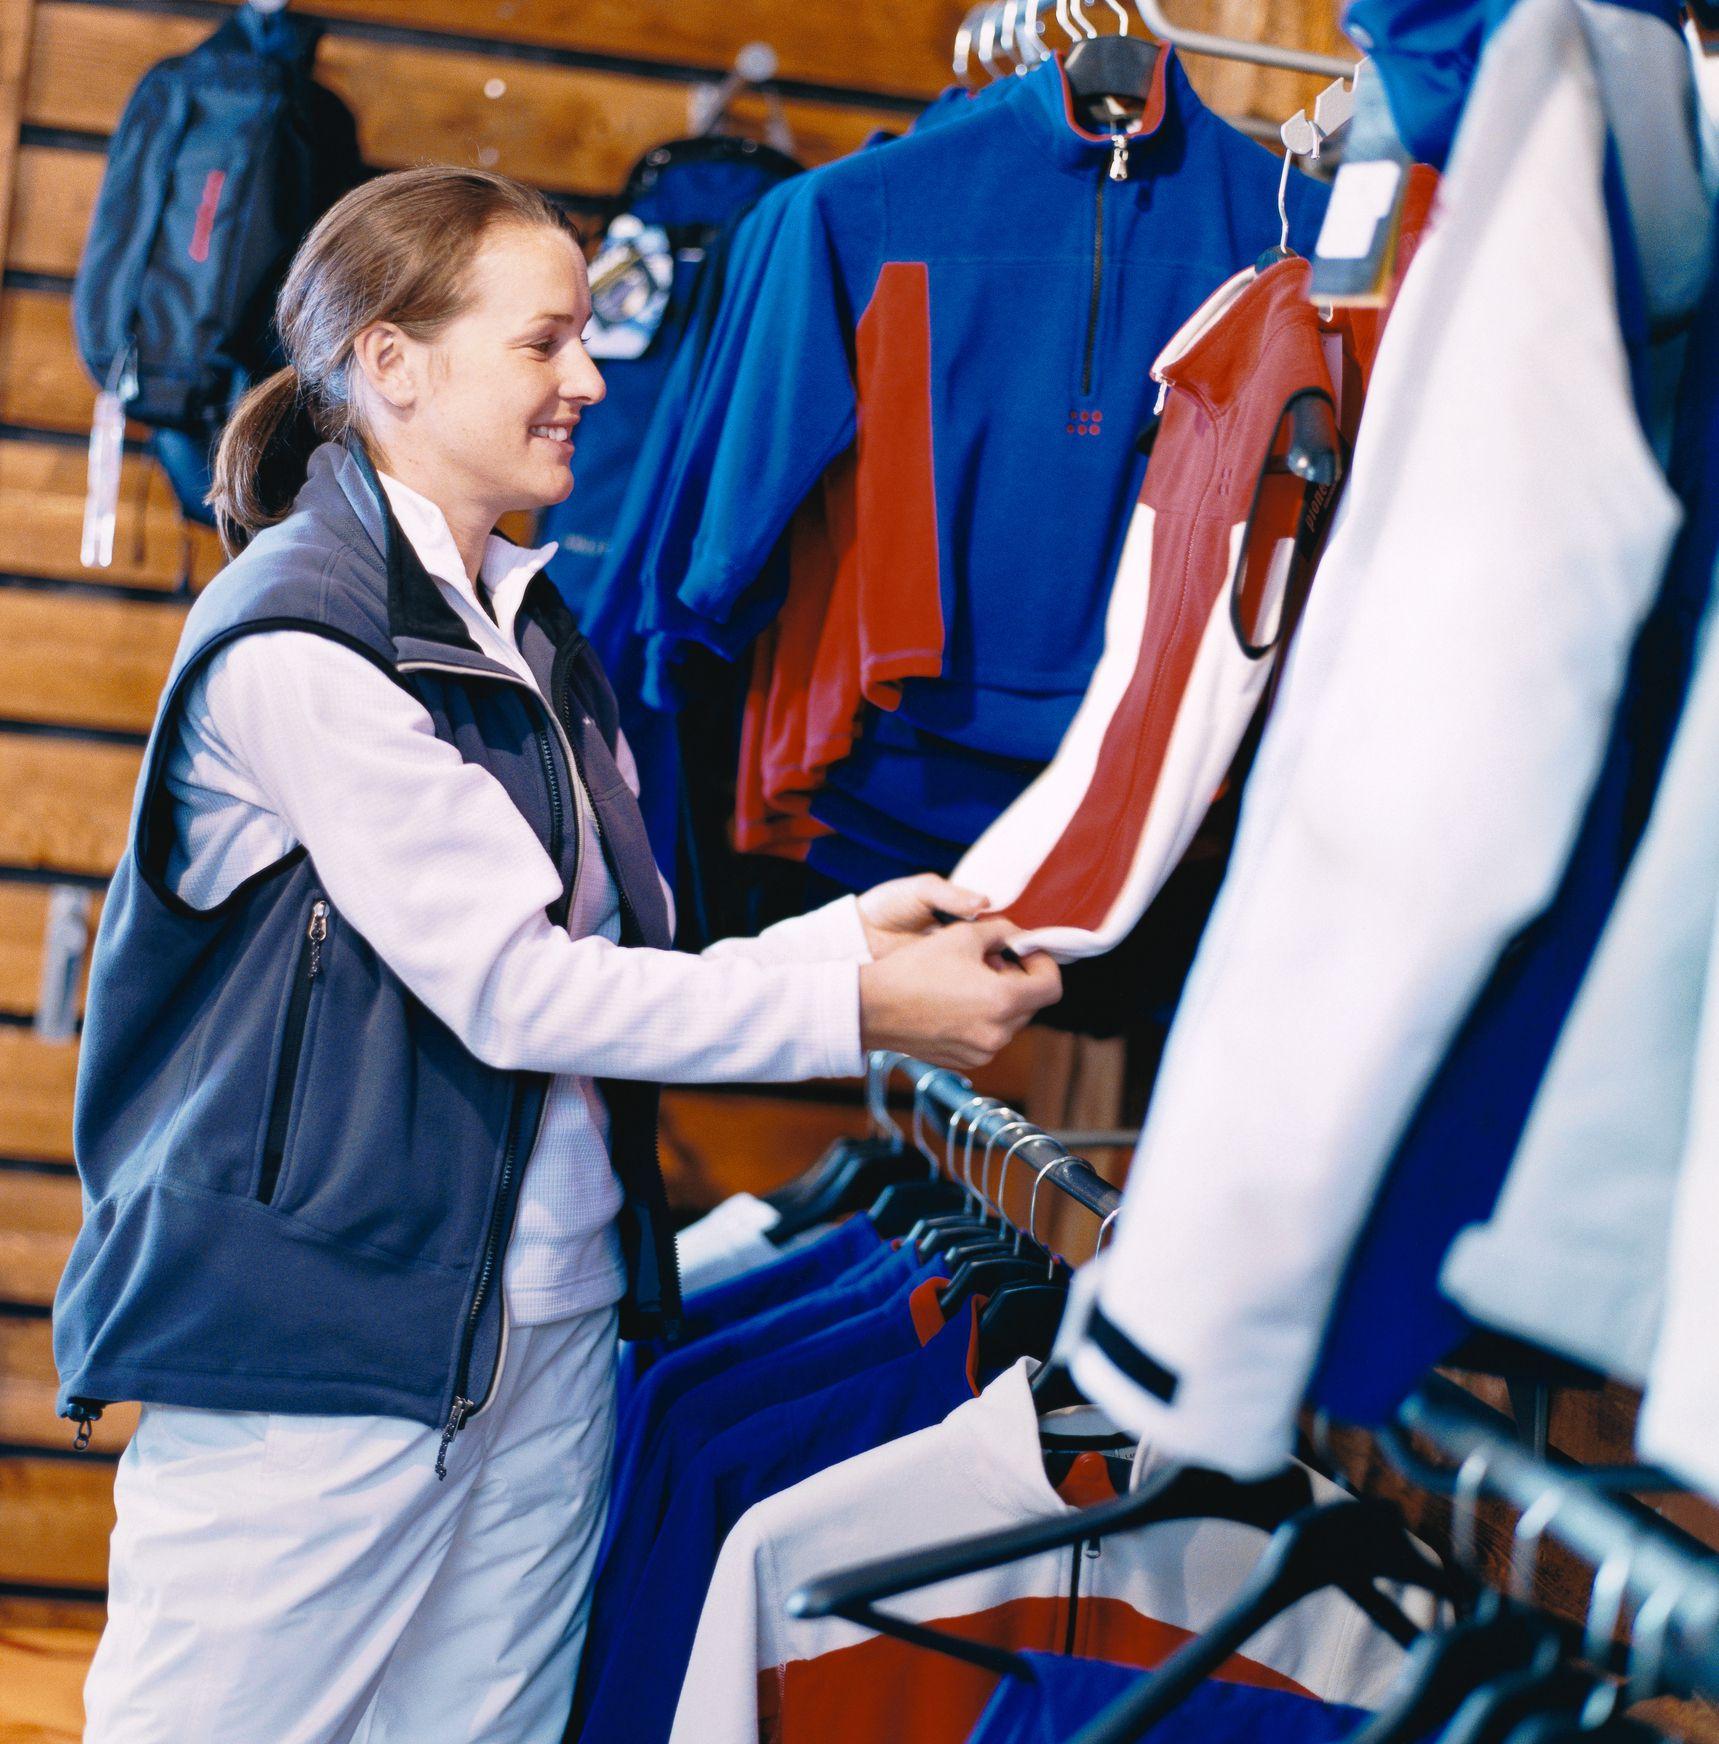 Where to Buy Vintage Ski Clothing